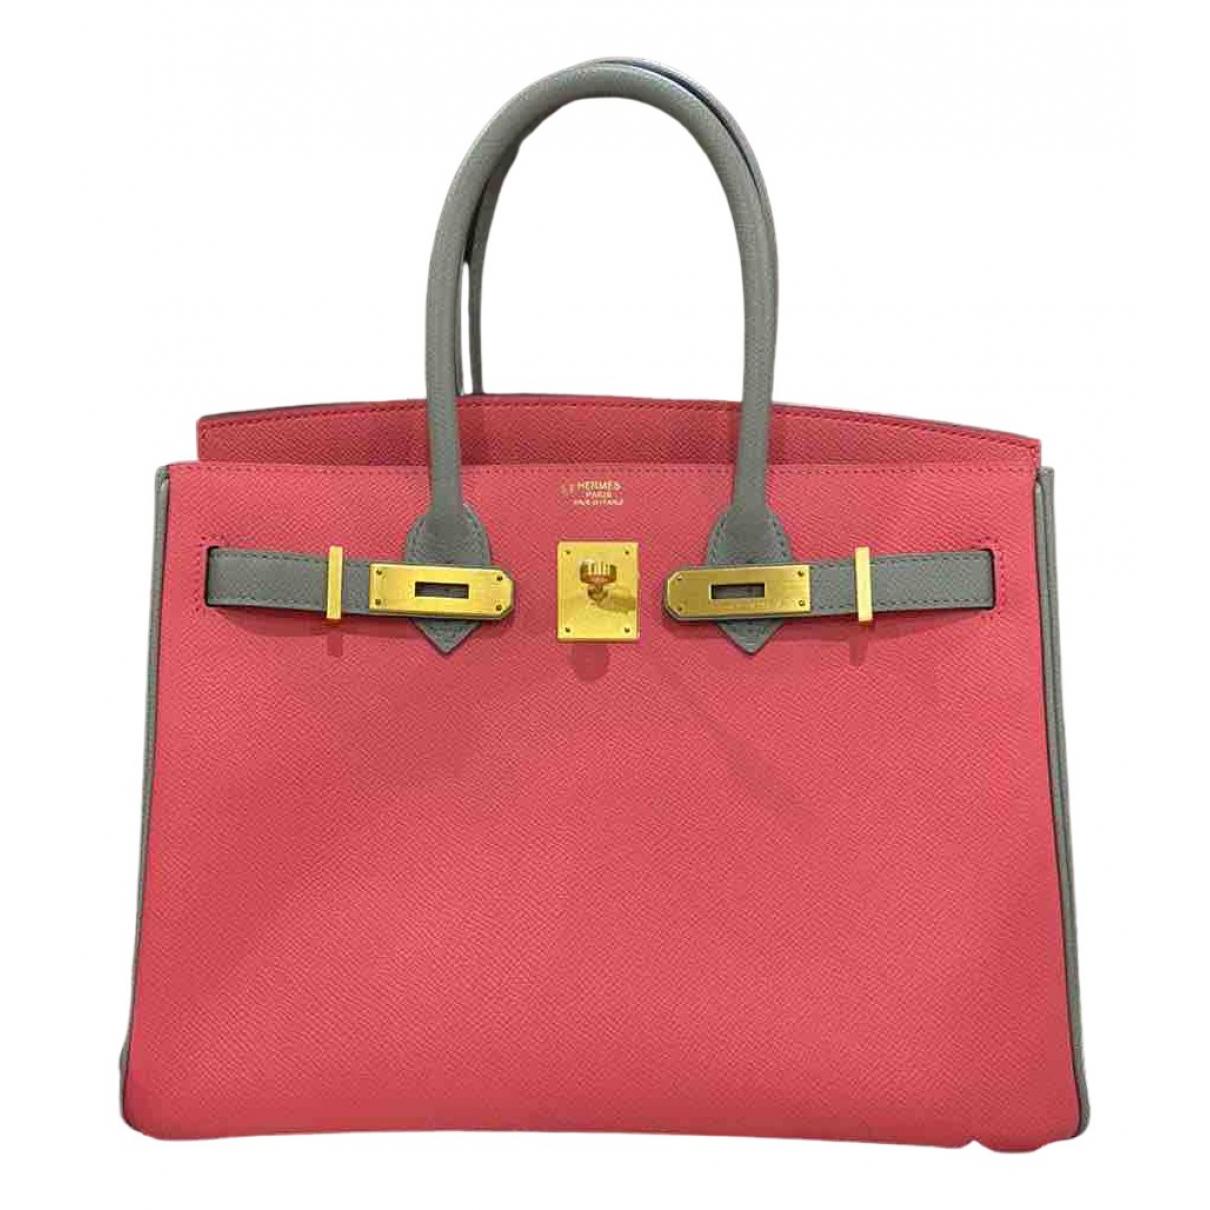 Hermes - Sac a main Birkin 30 pour femme en cuir - rose